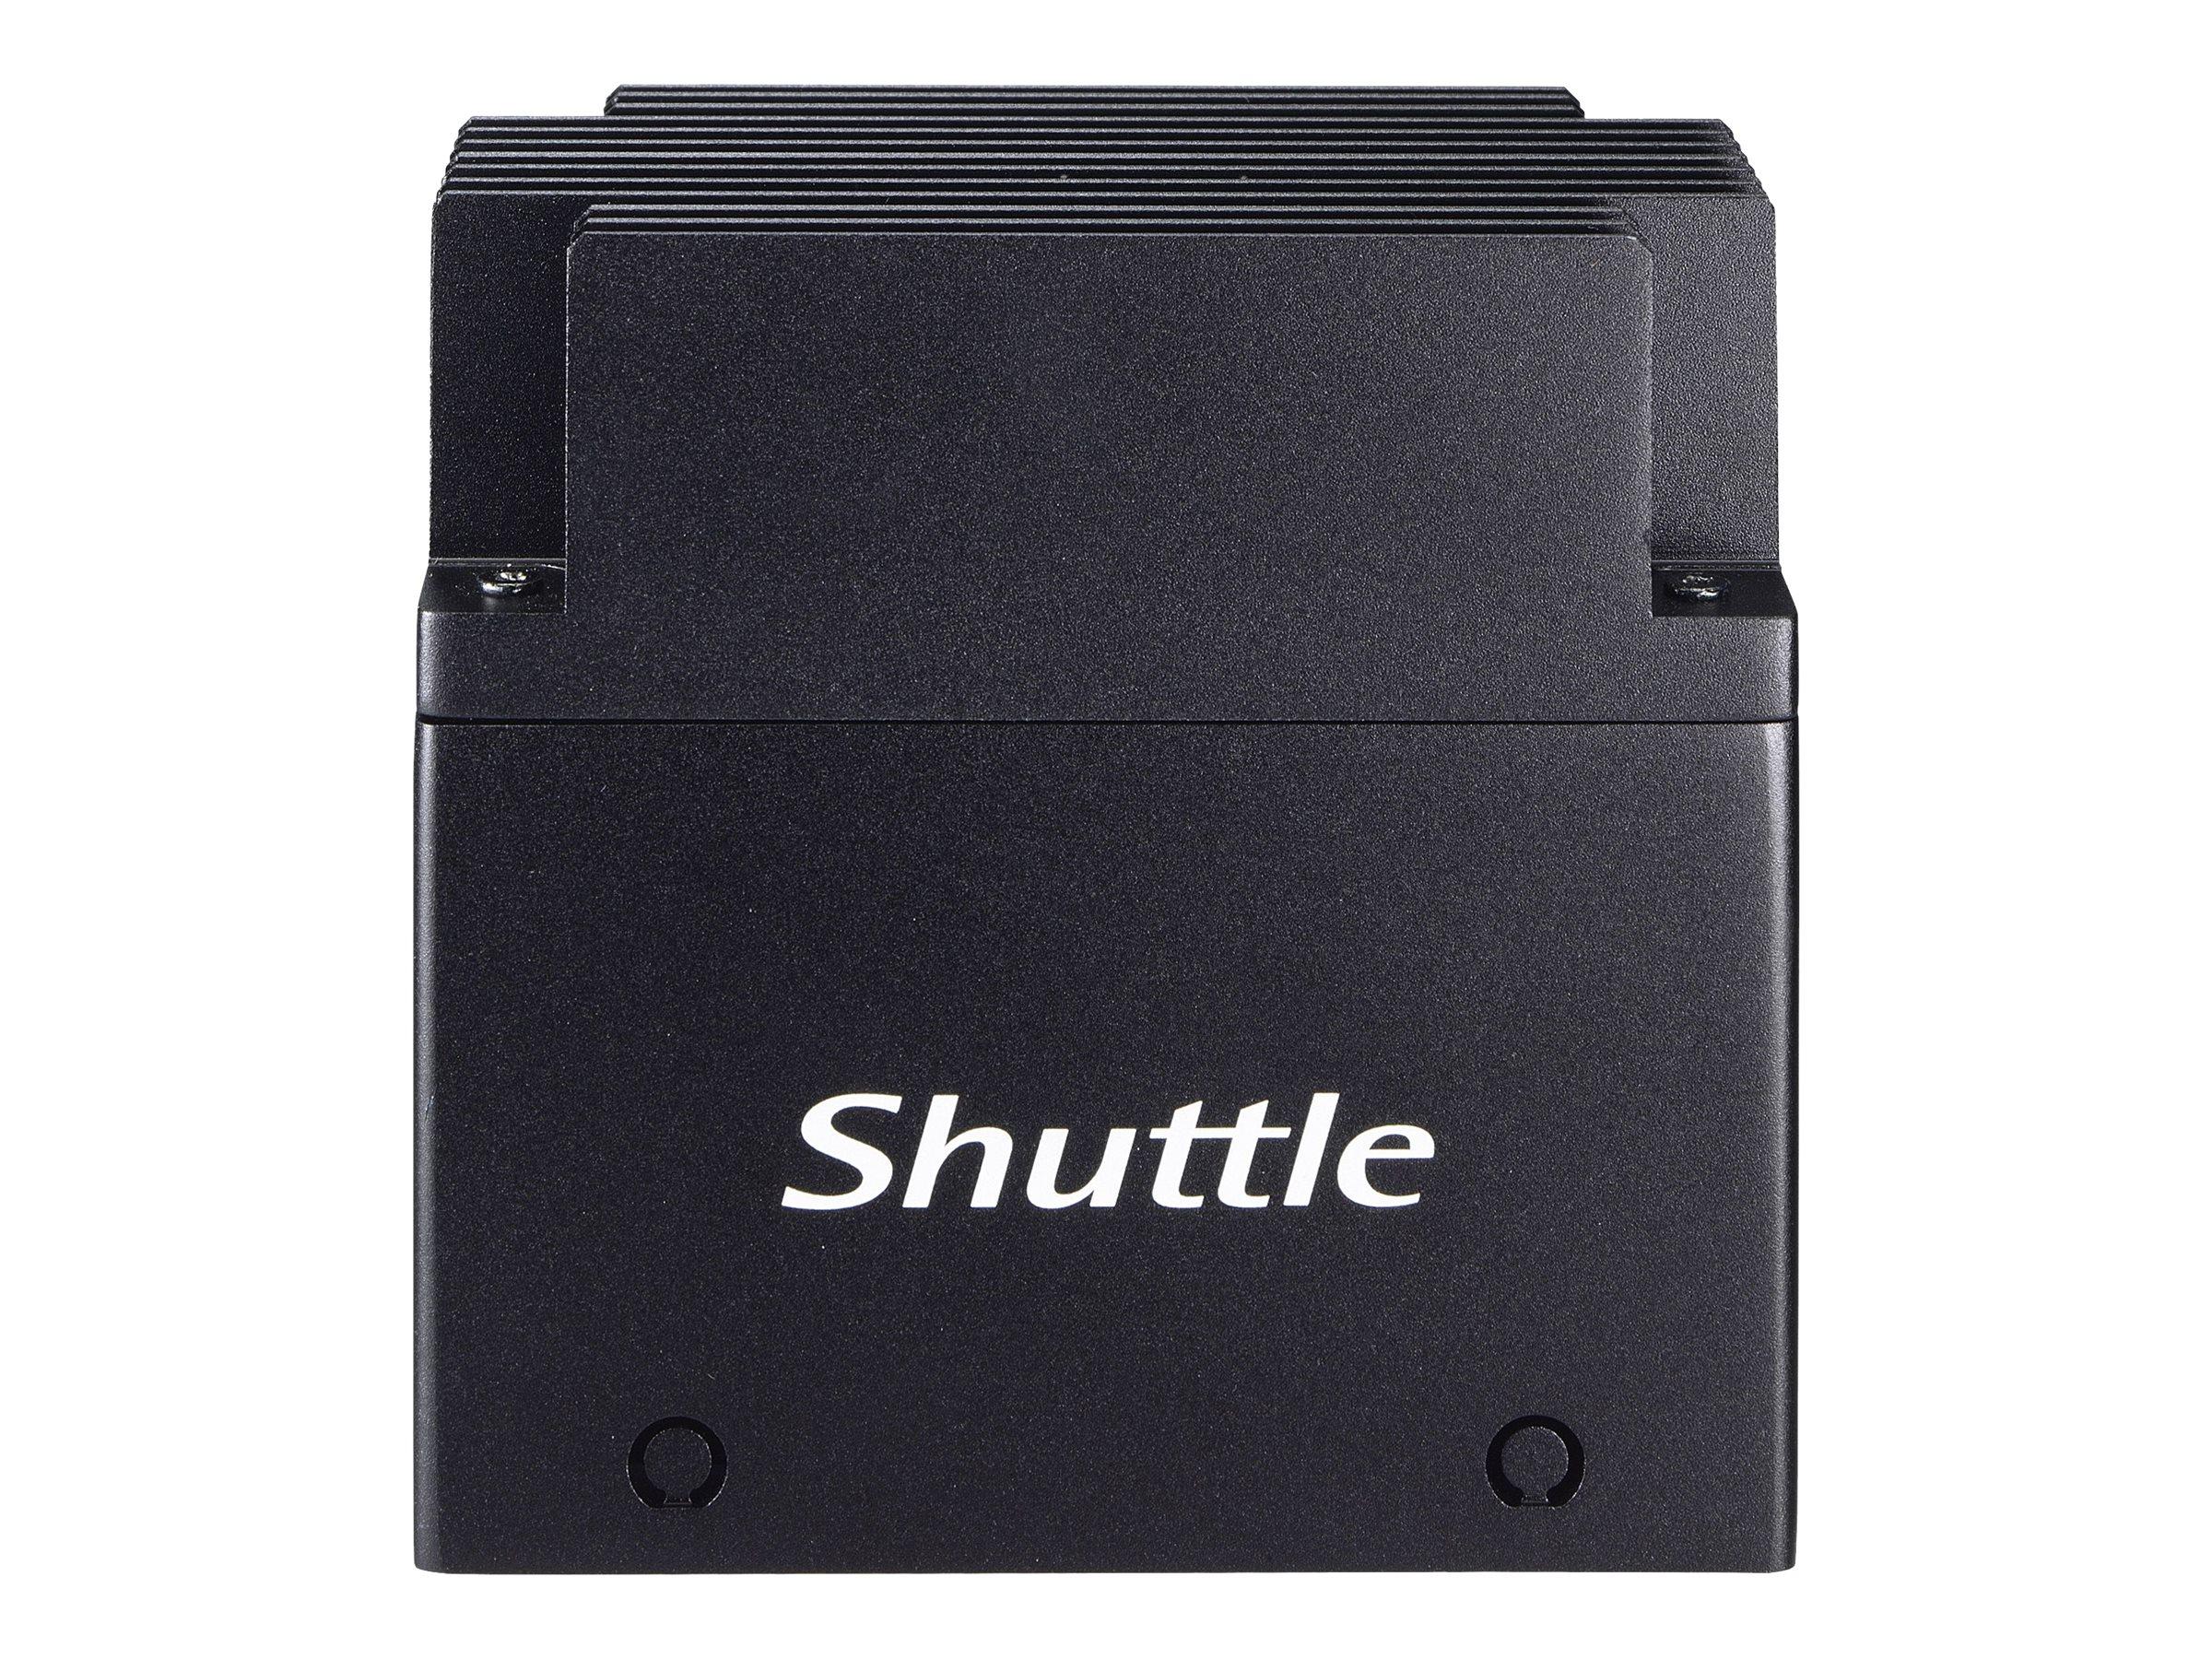 Shuttle Edge series EN01J3 - USFF - Celeron J3355 / 2 GHz